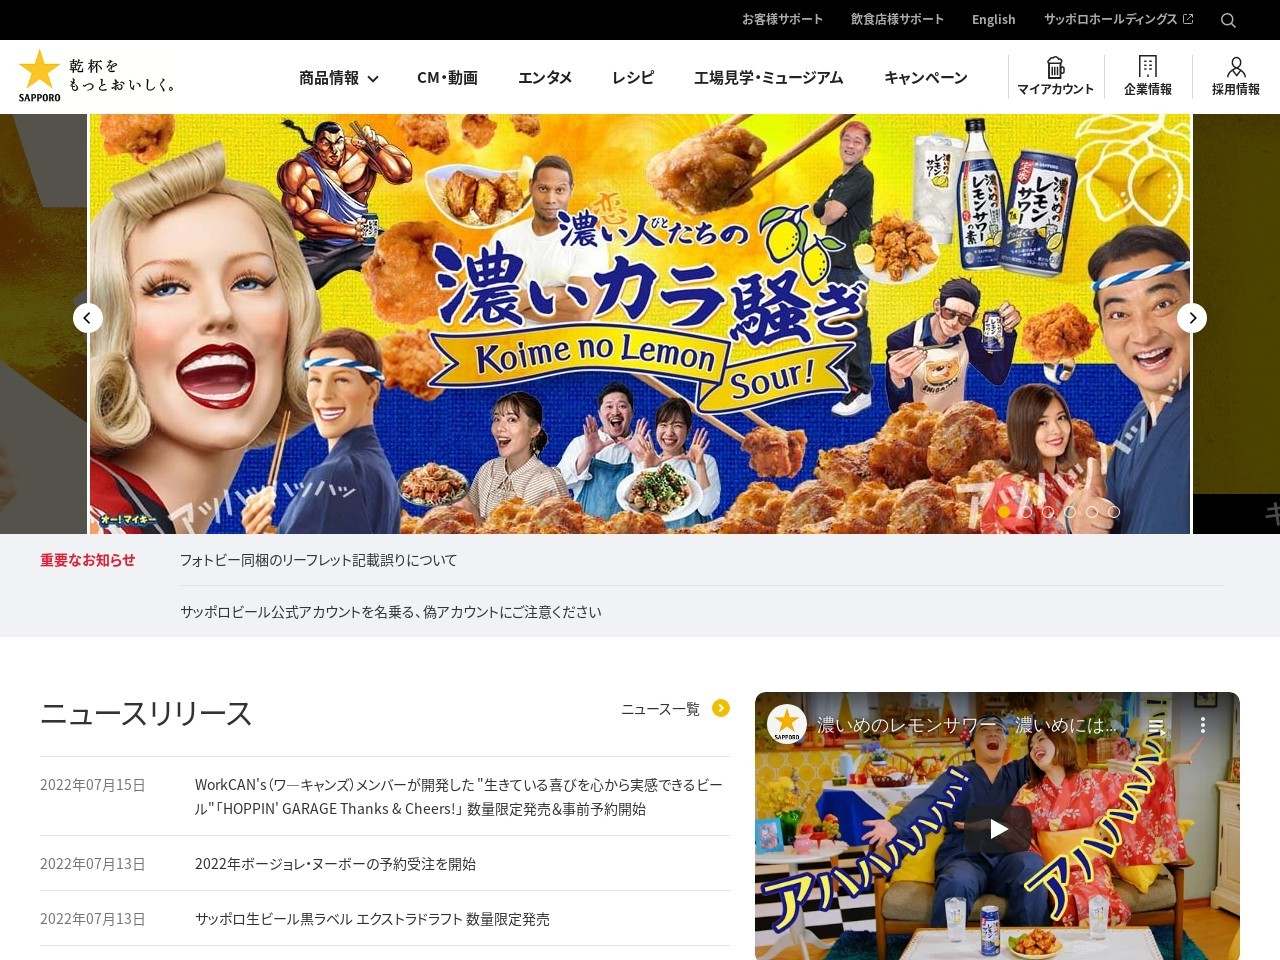 http://www.sapporobeer.jp/shochu/muginowa/campaign/index2.html